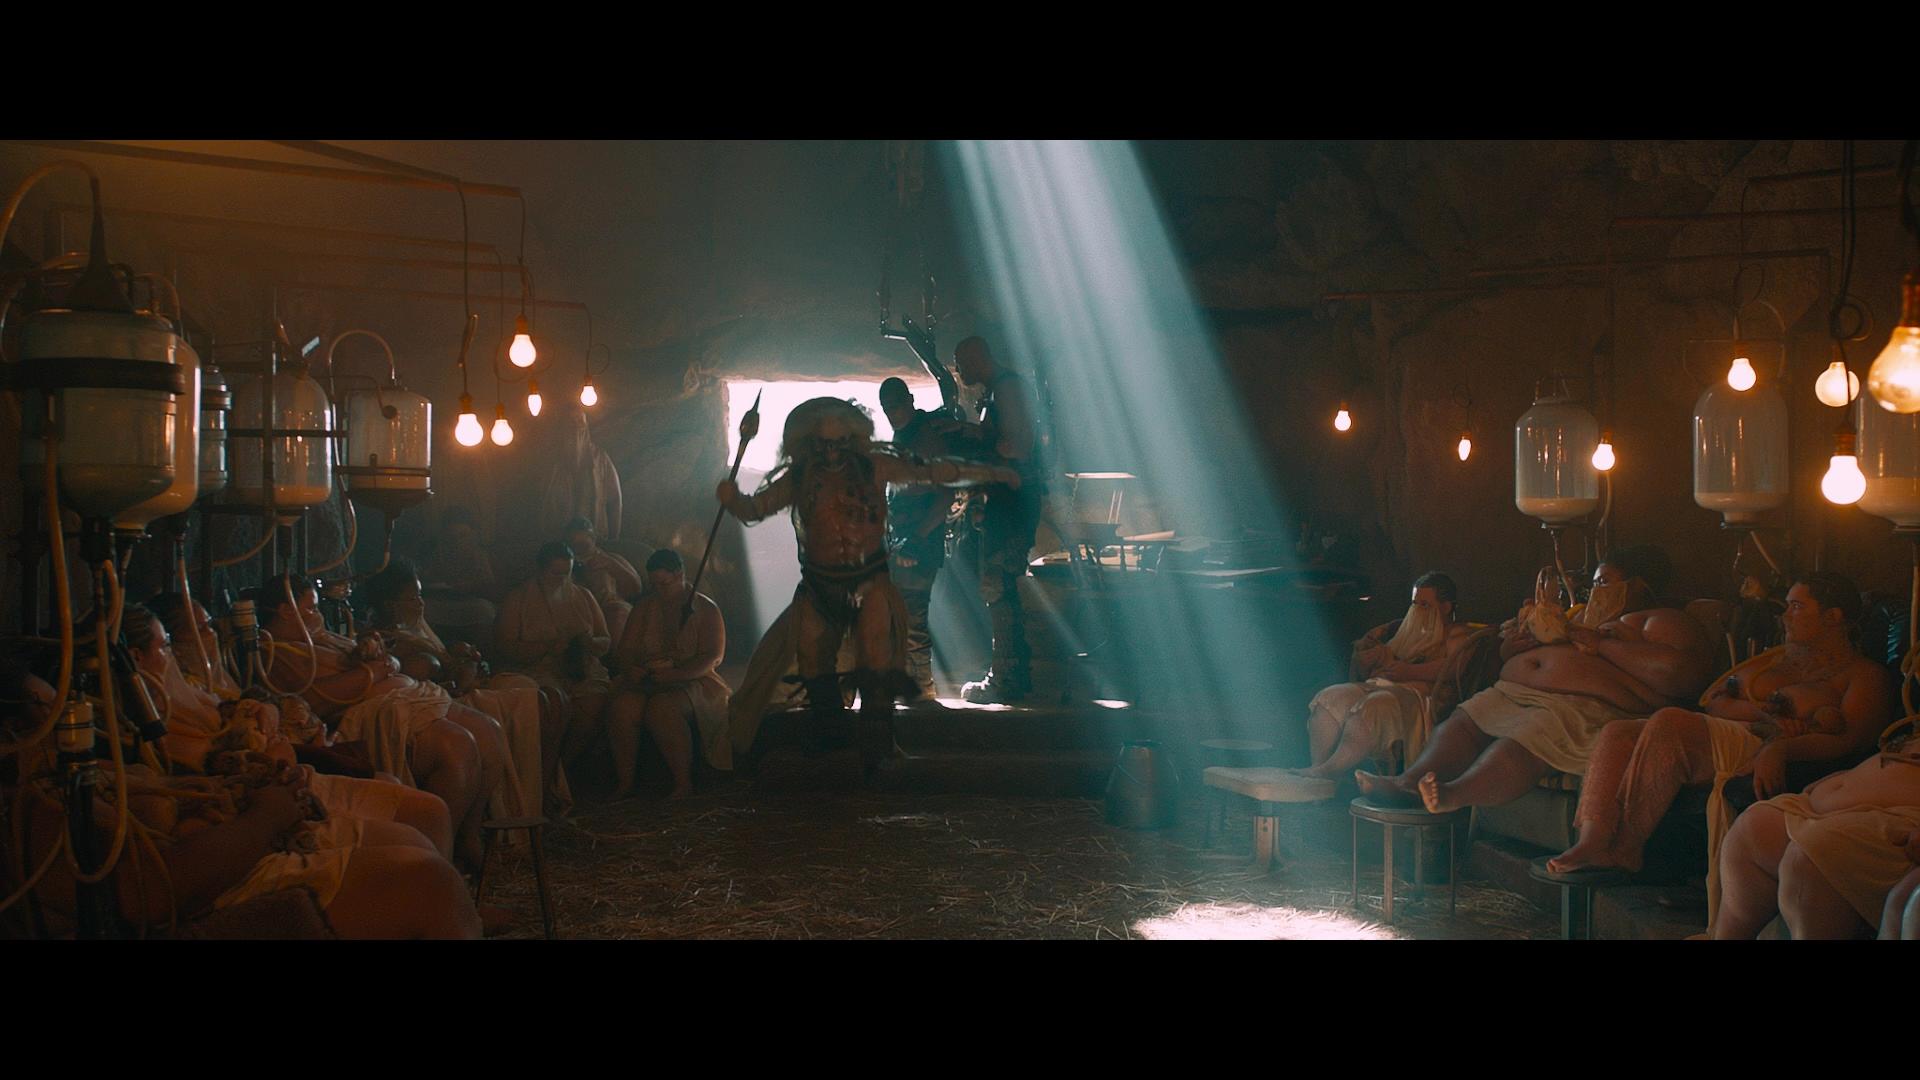 Безумный Макс: Дорога ярости / Mad Max: Fury Road (2015) Blu-Ray Remux 1080p | Лицензия